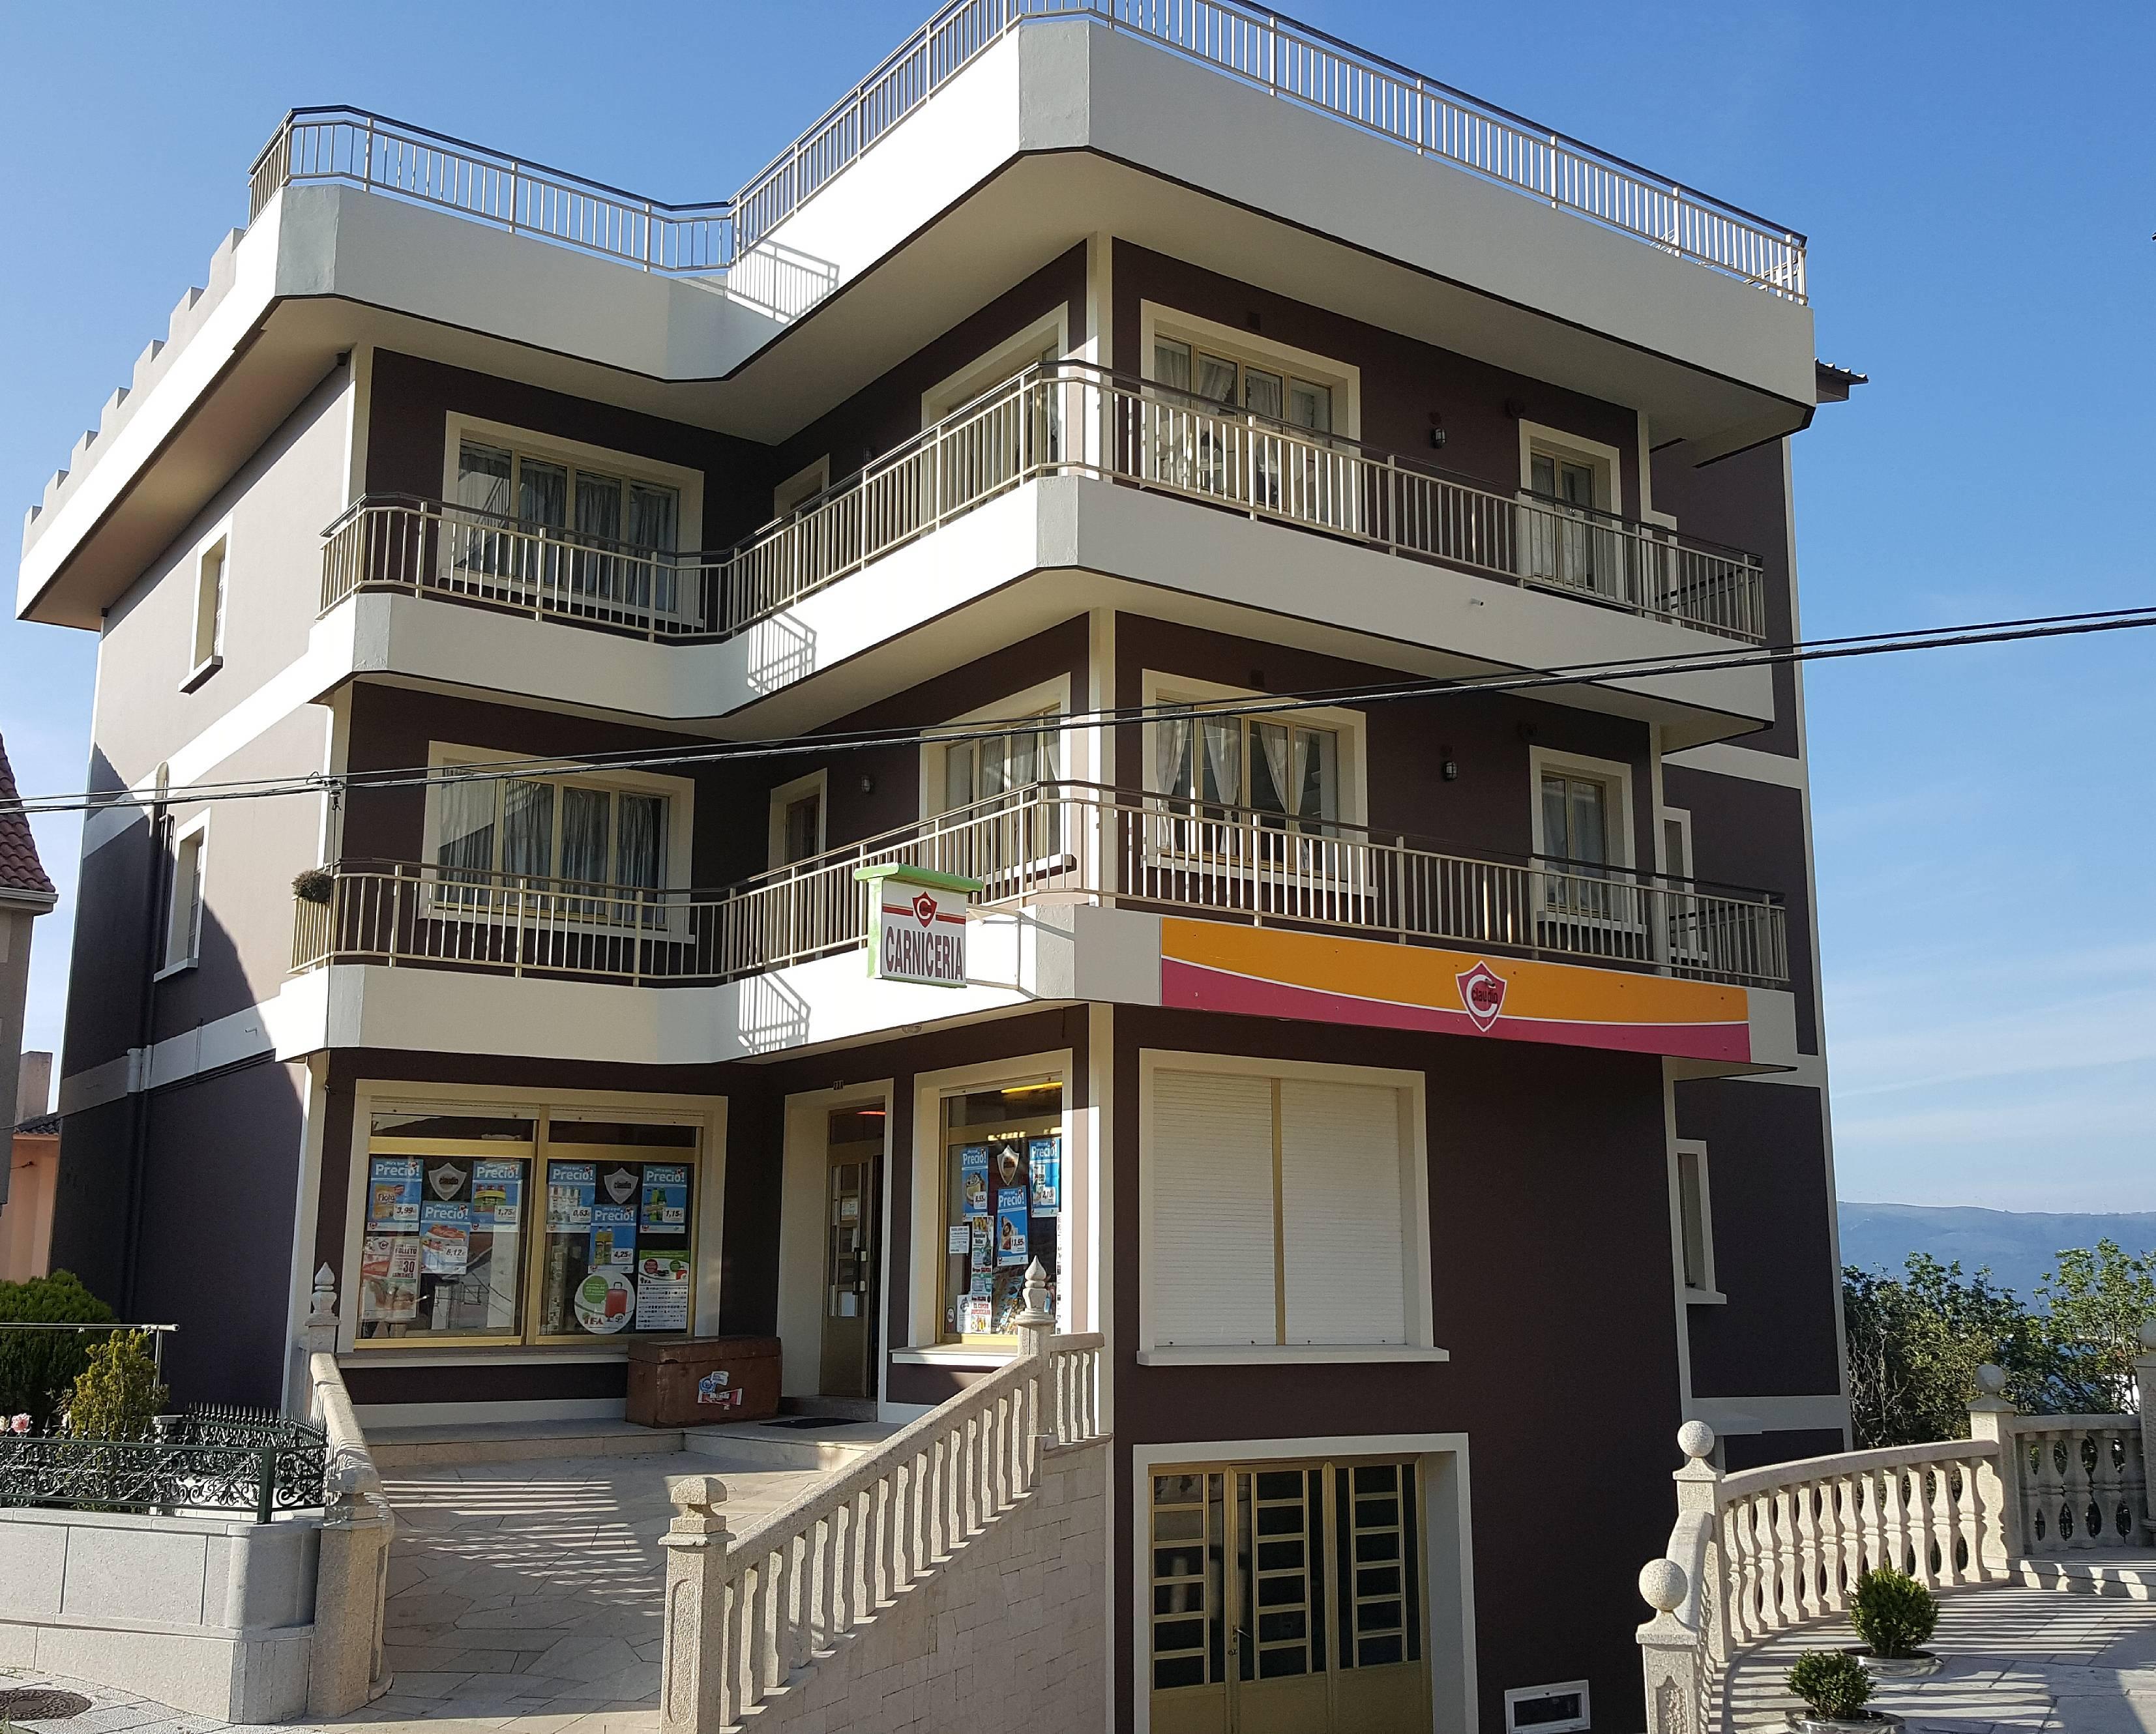 Apartamento alquiler verano playa de lira carnota lira - Apartamentos verano playa ...